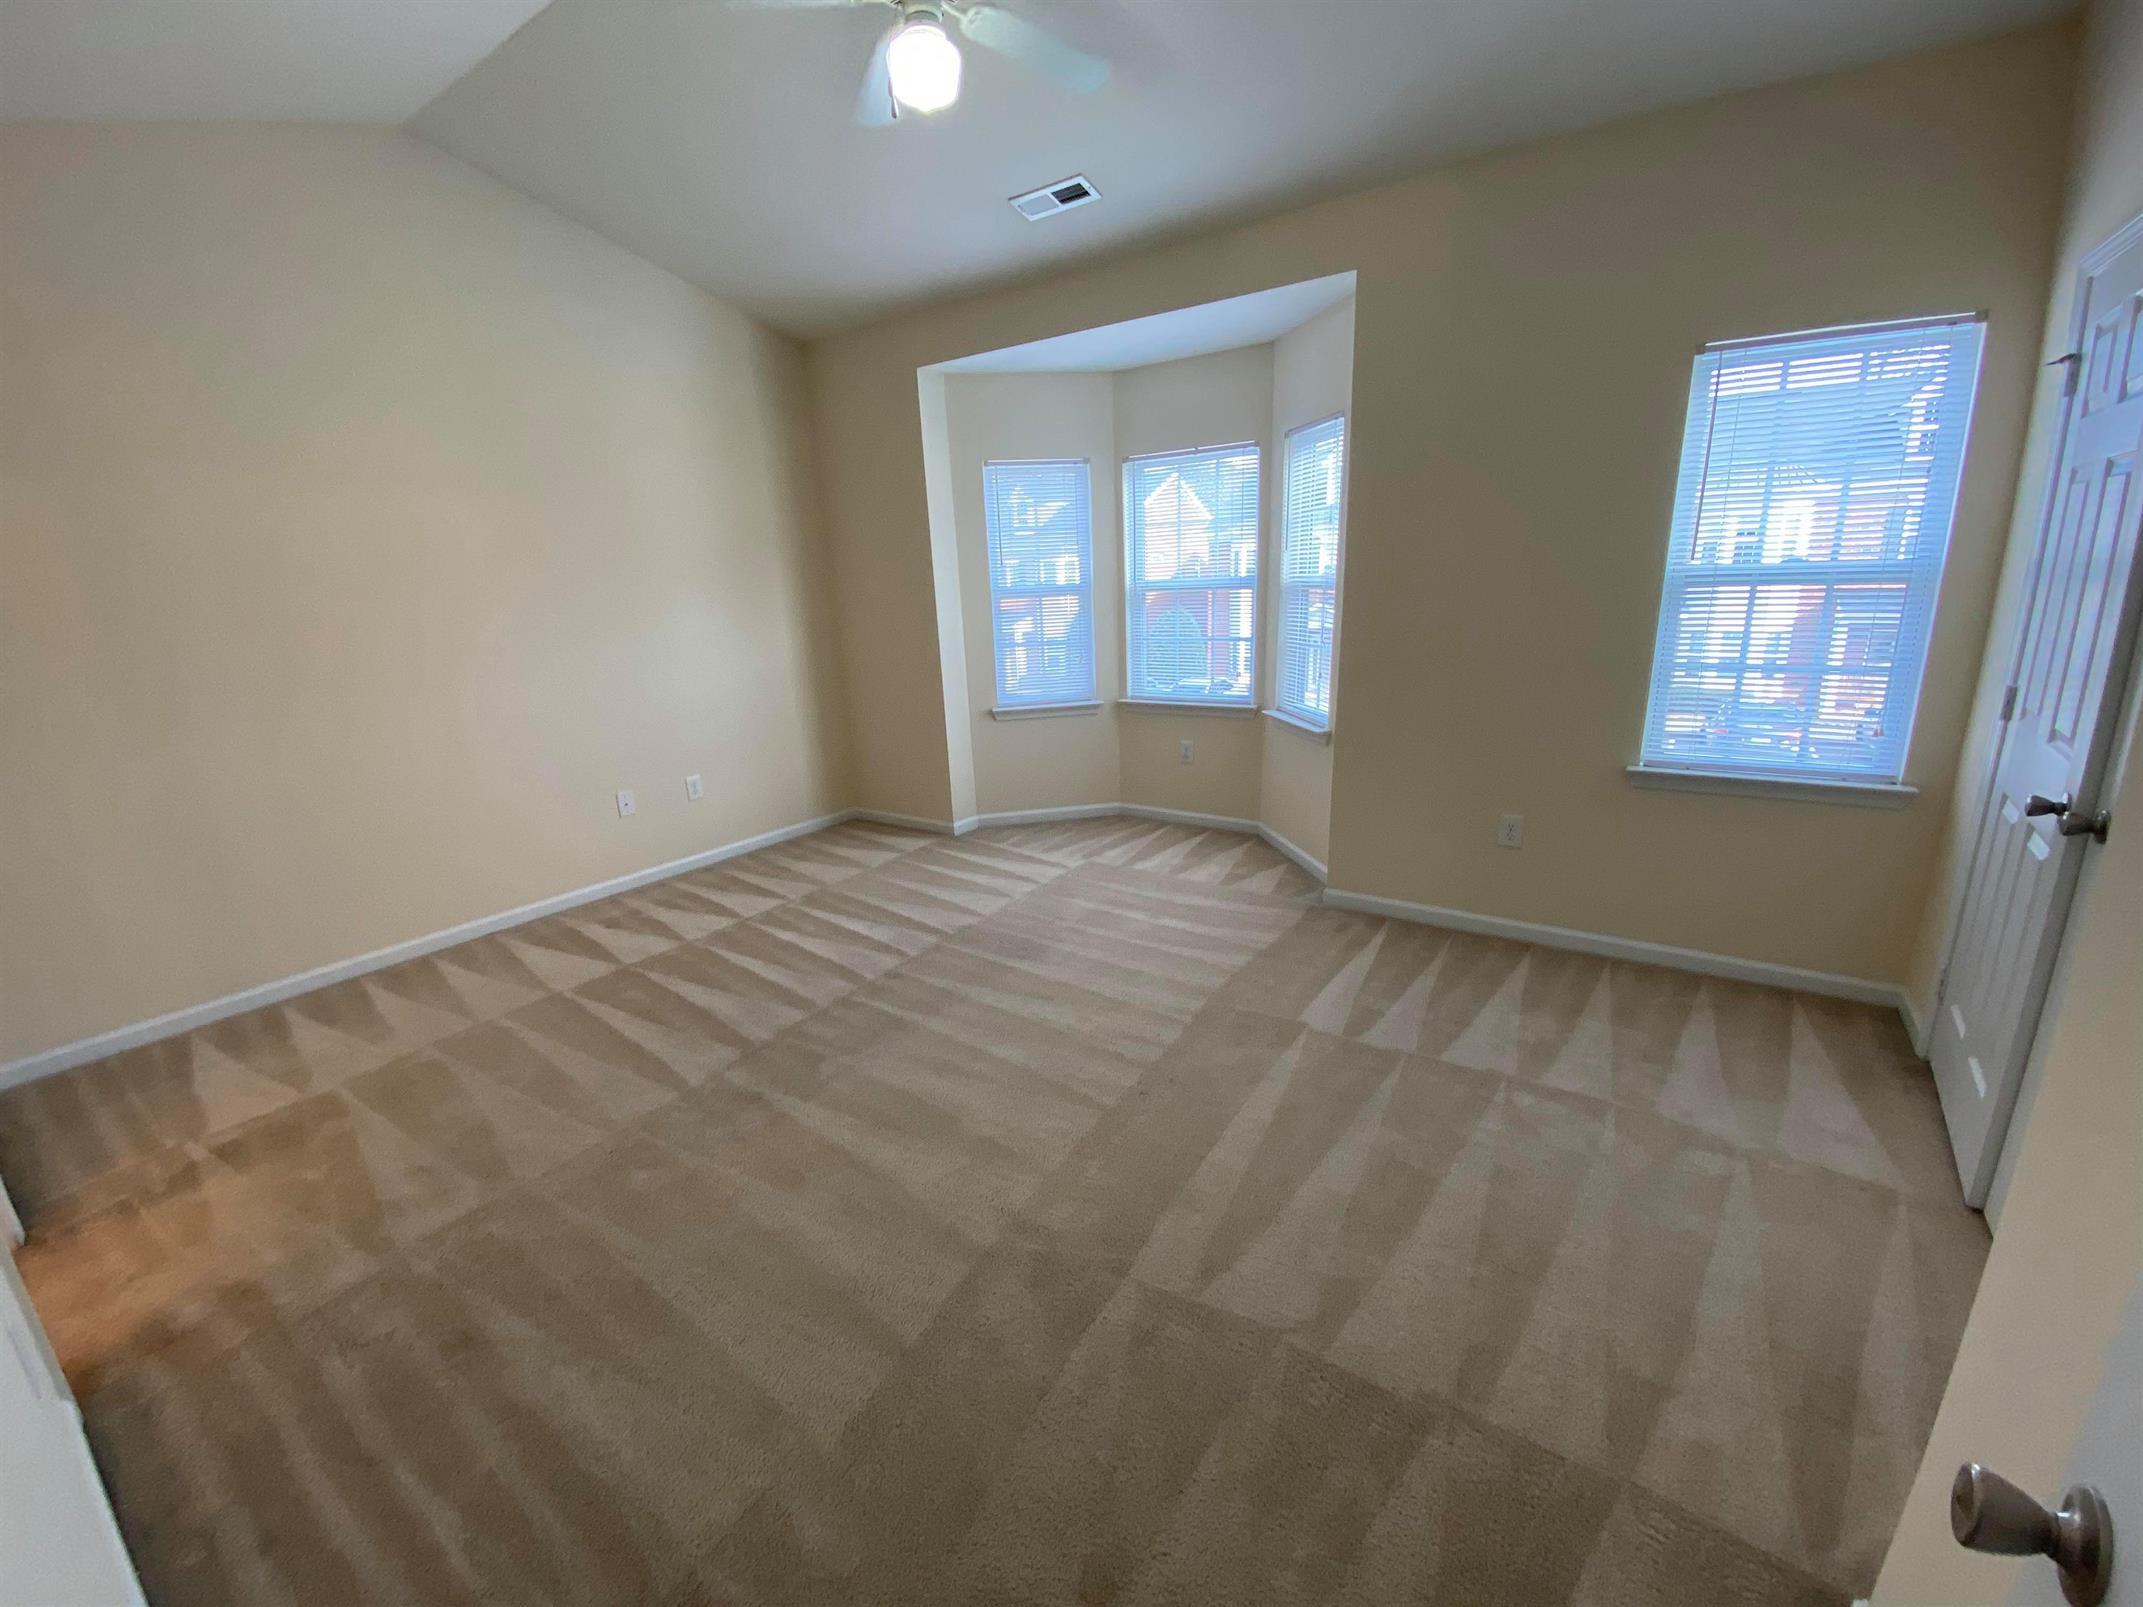 Image of Maynard Summit 2 Bedroom Cary, NC 27511